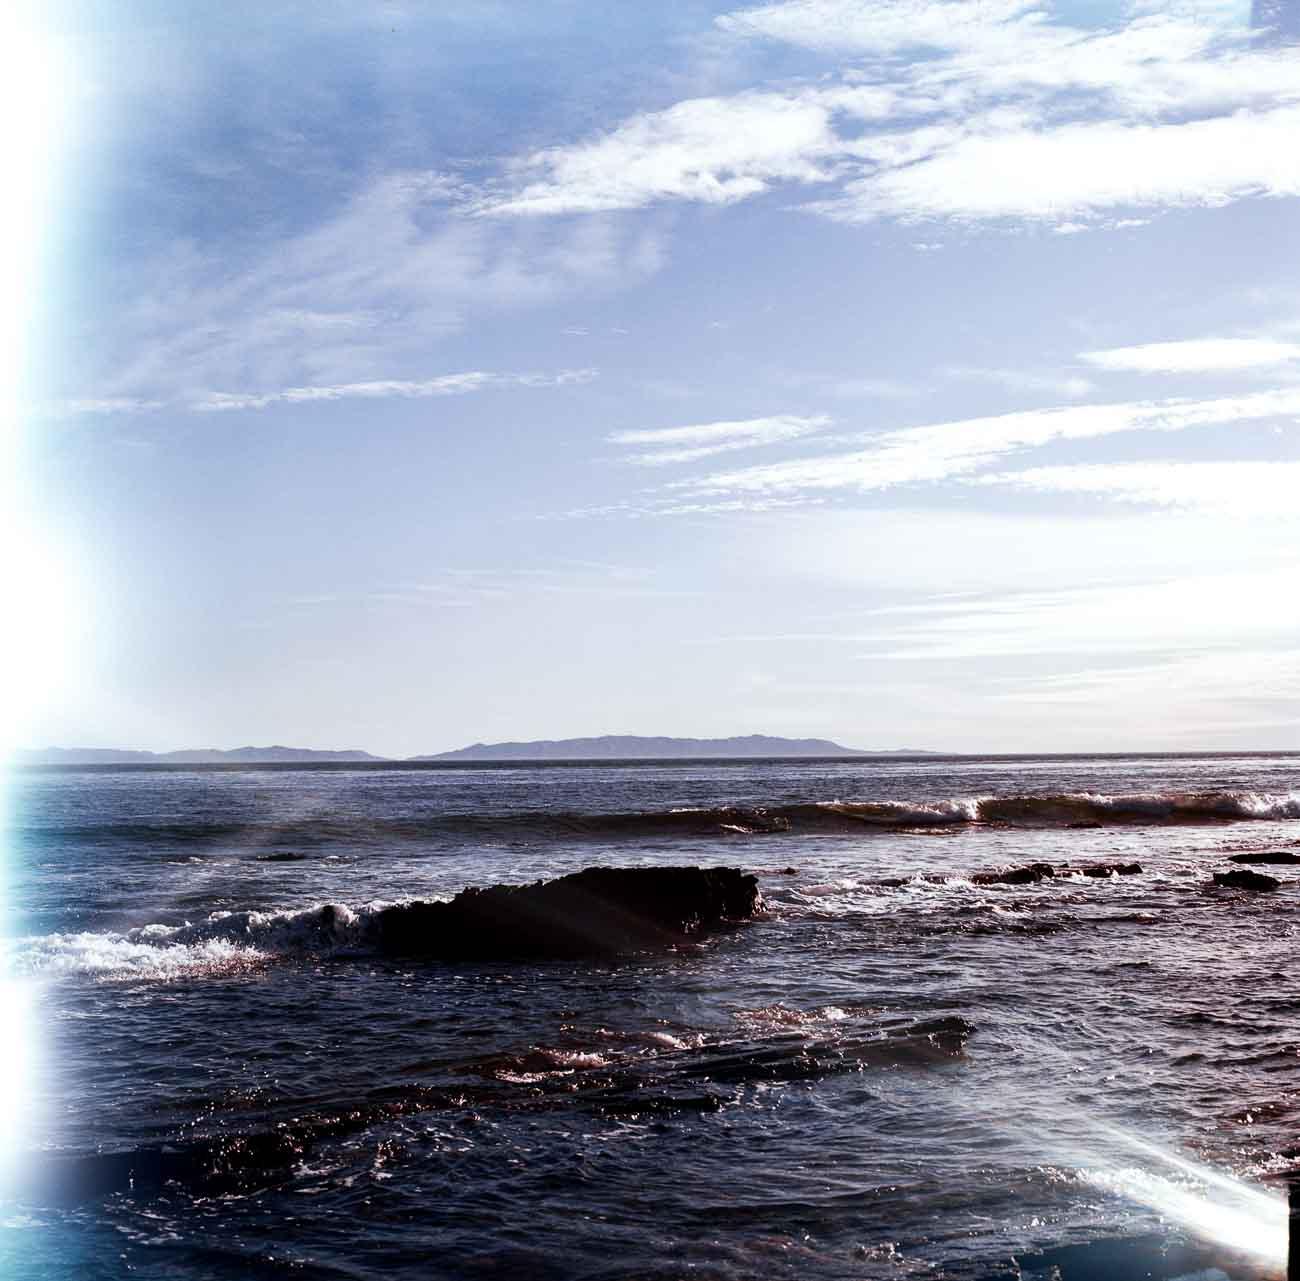 The rocky coast of San Pedro, CA